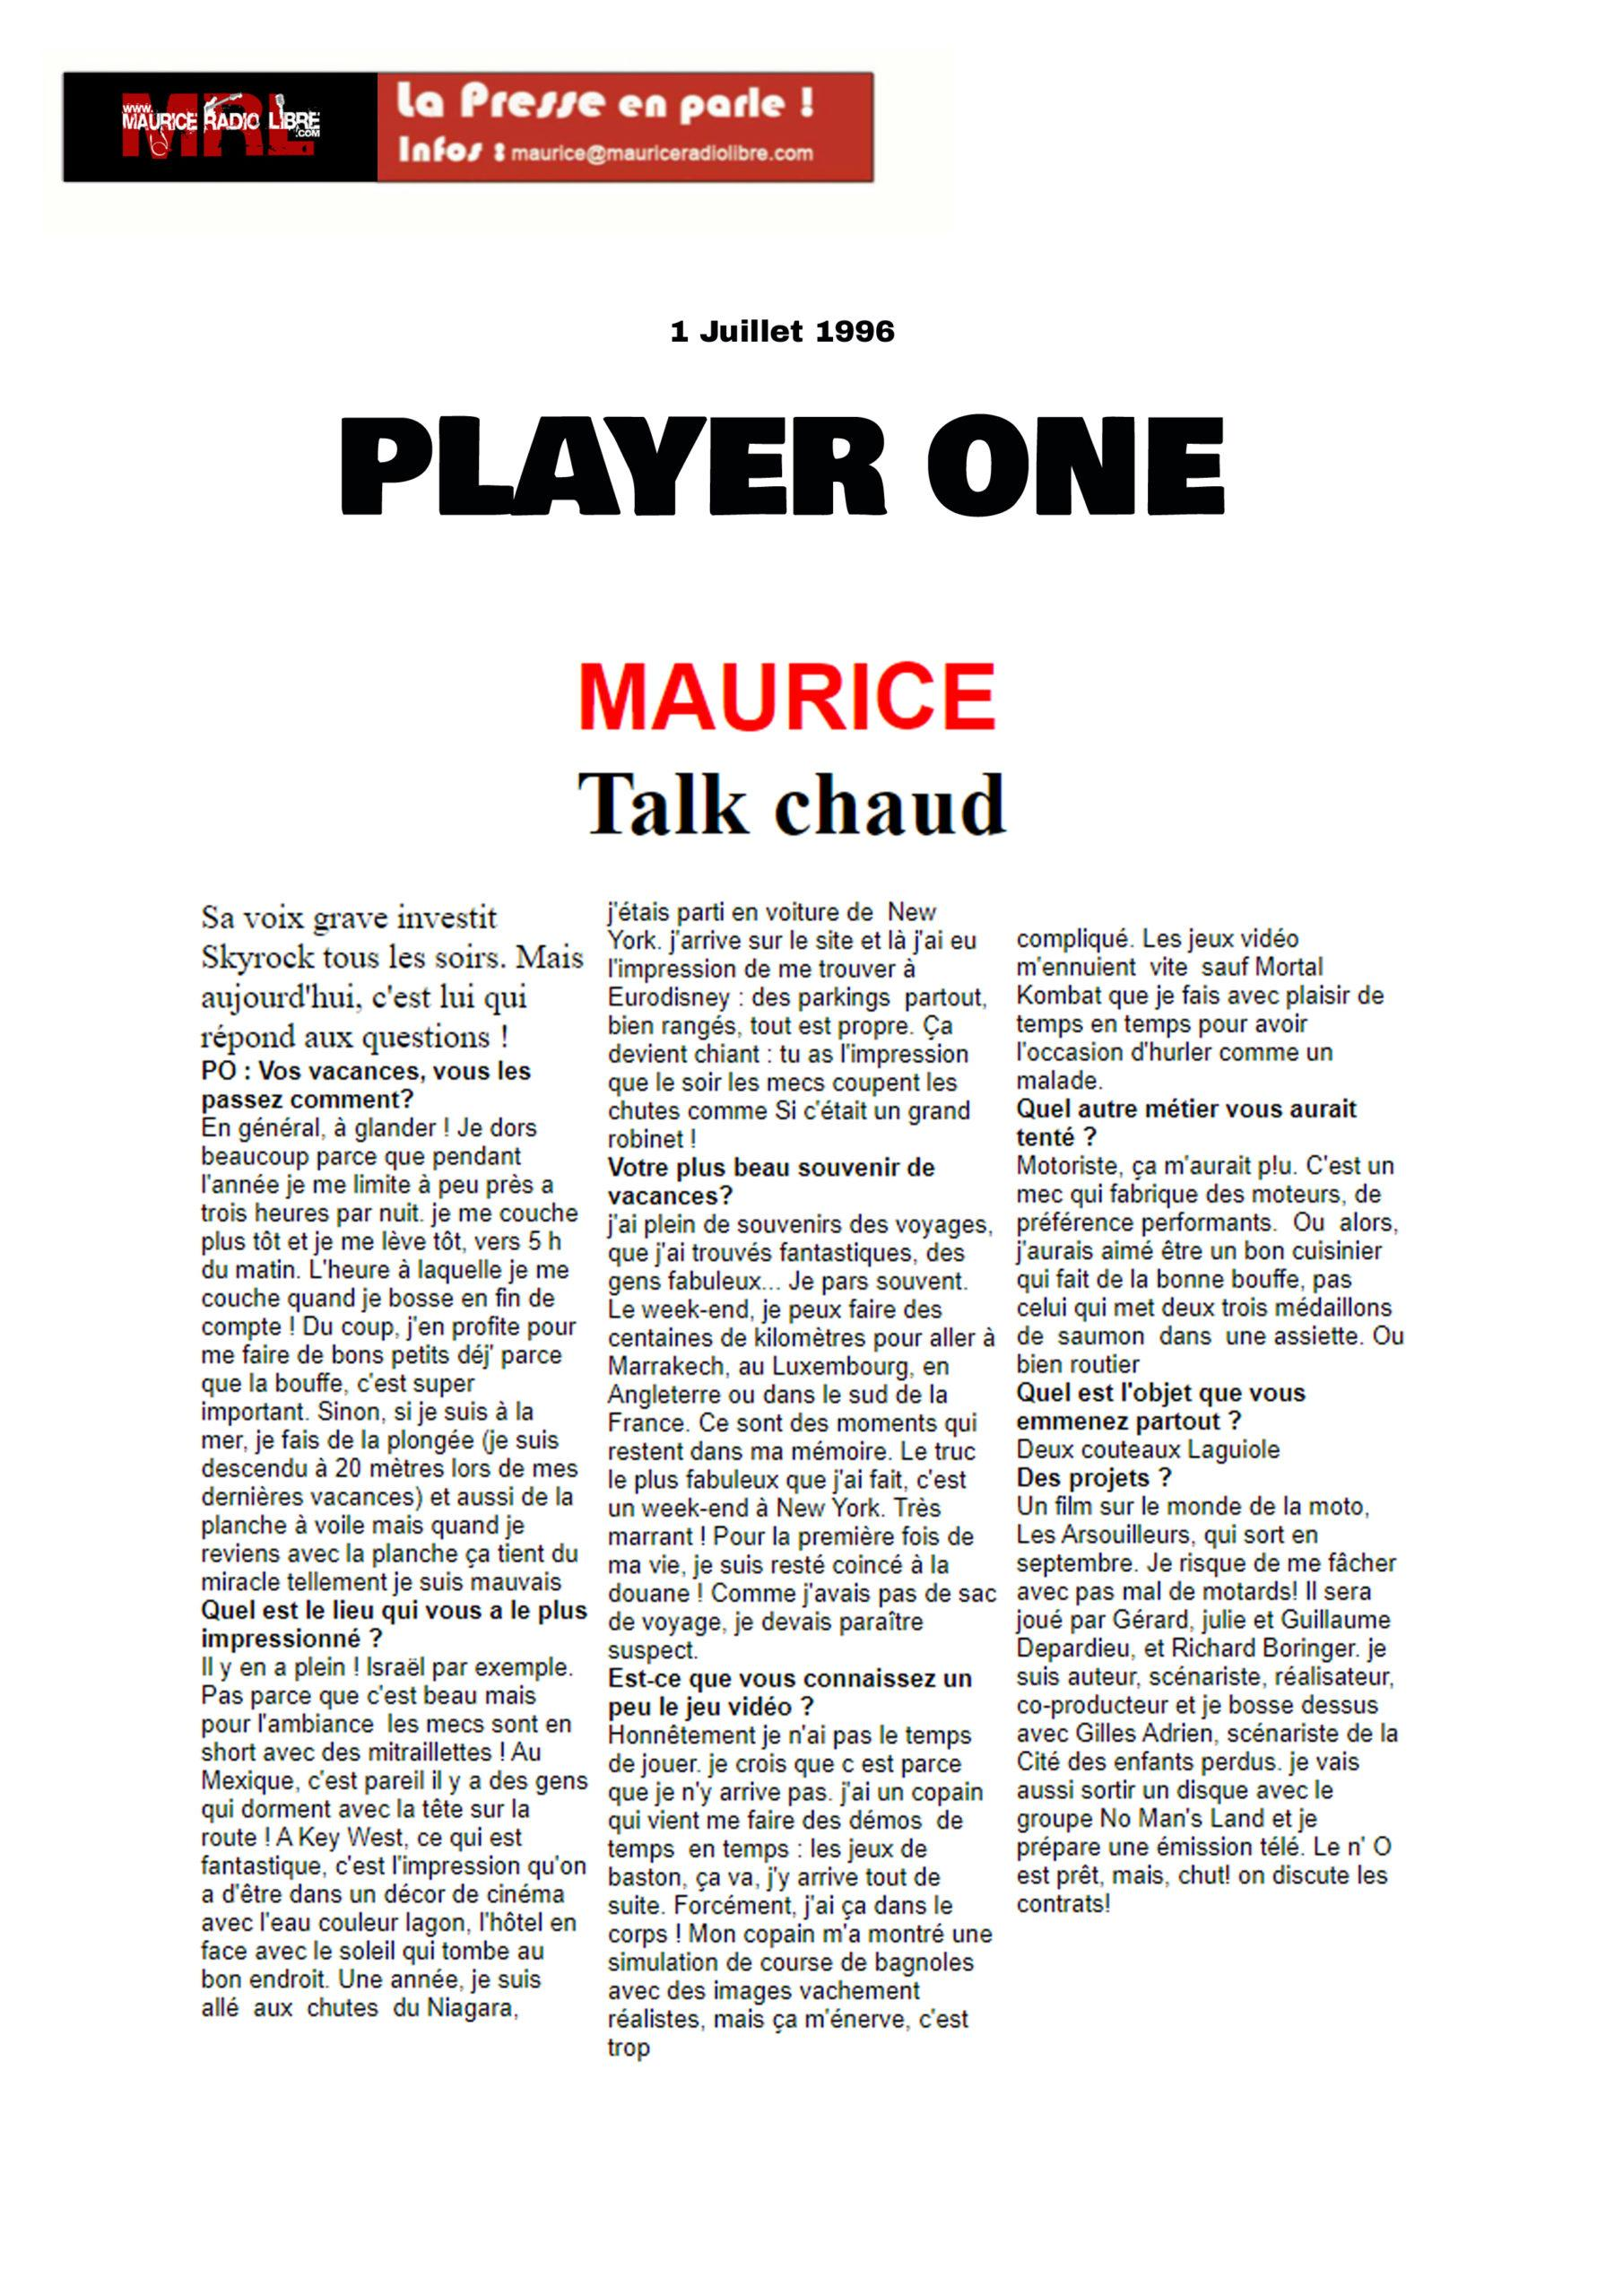 vignette Player One MAURICE Talk chaud - 01/07/1996